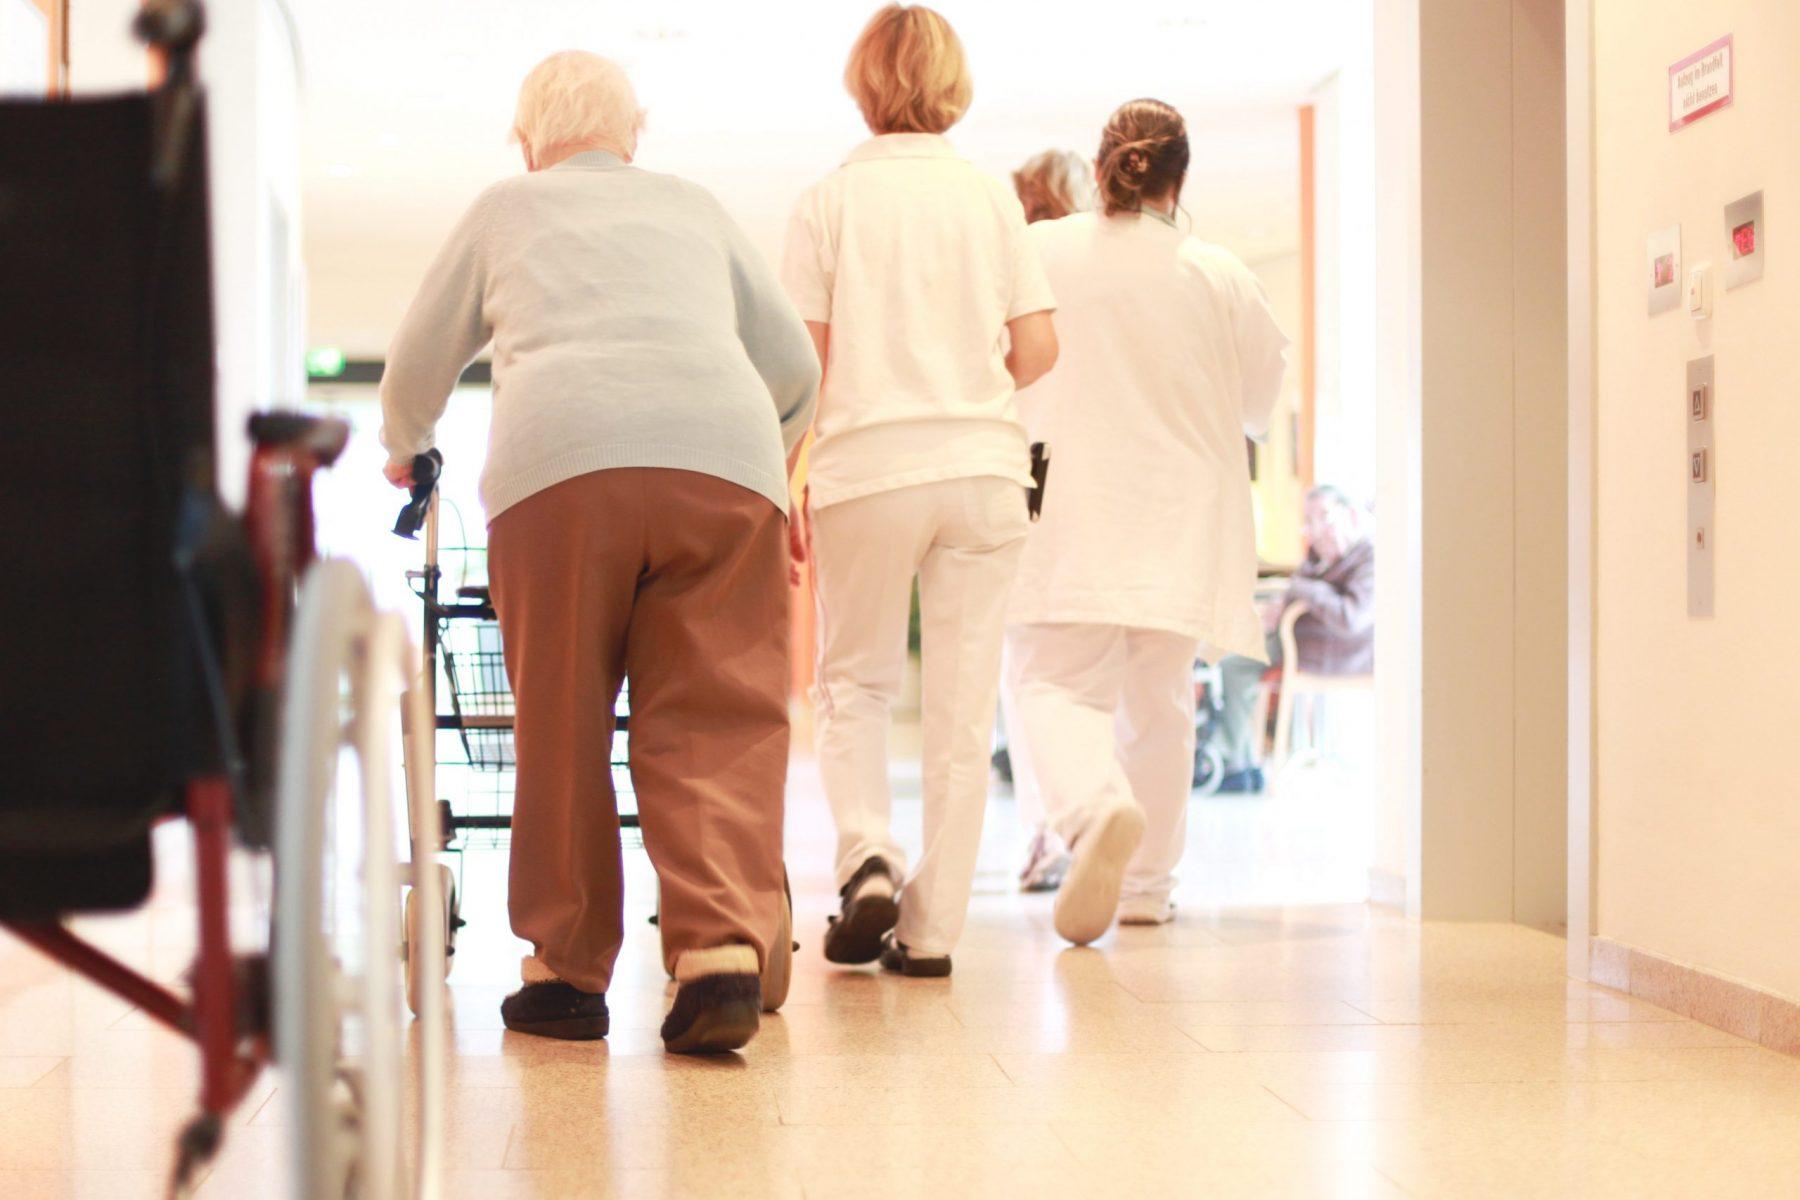 Elderly woman accompanied by nurses moves down a hallway